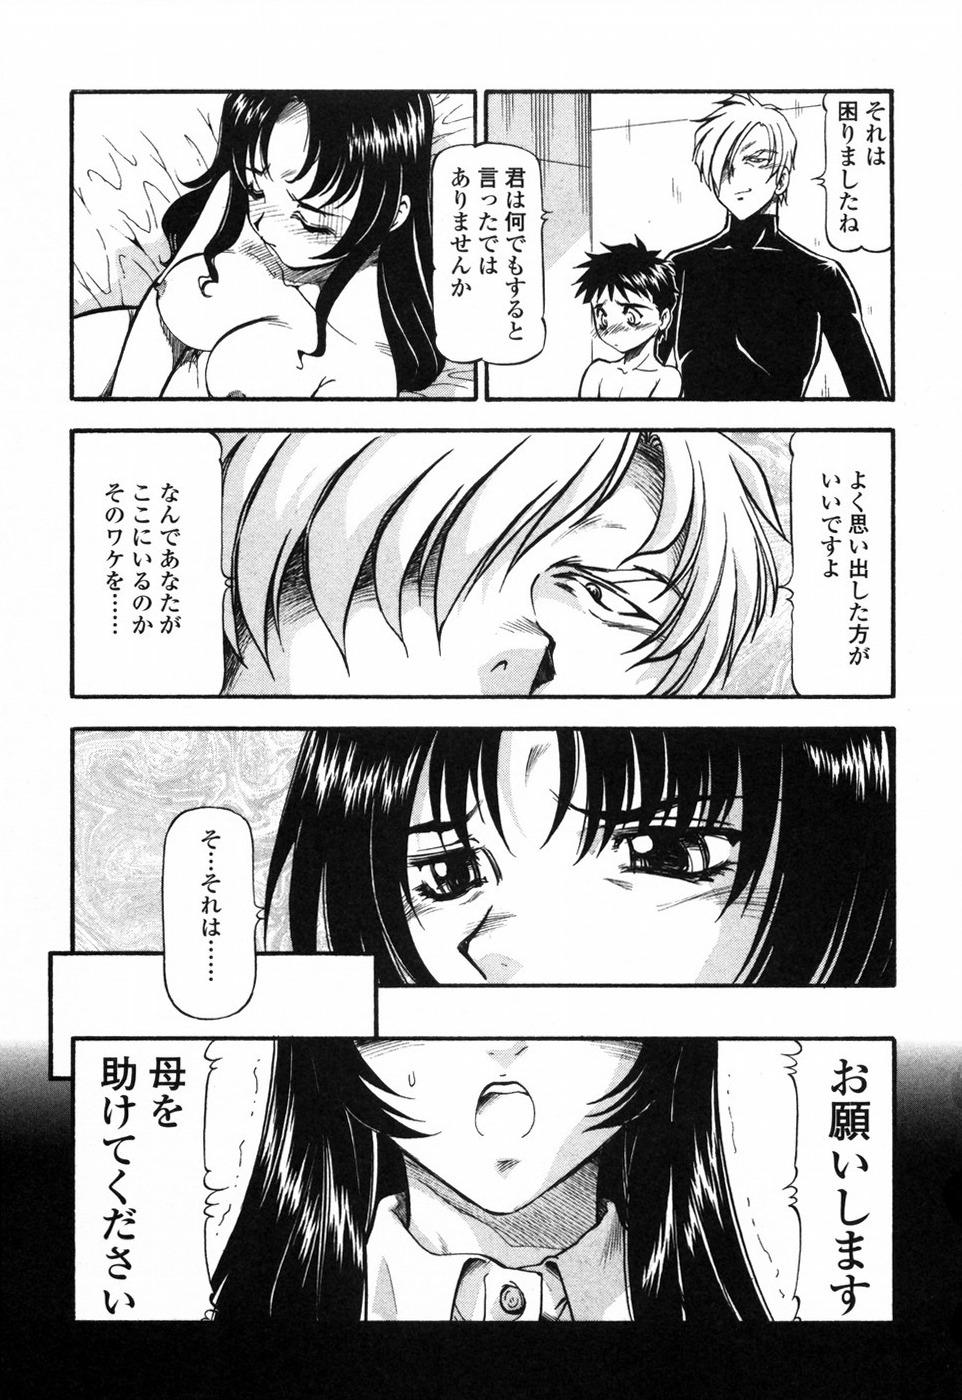 Kichiku Houteishiki - Equation of brutal person 94